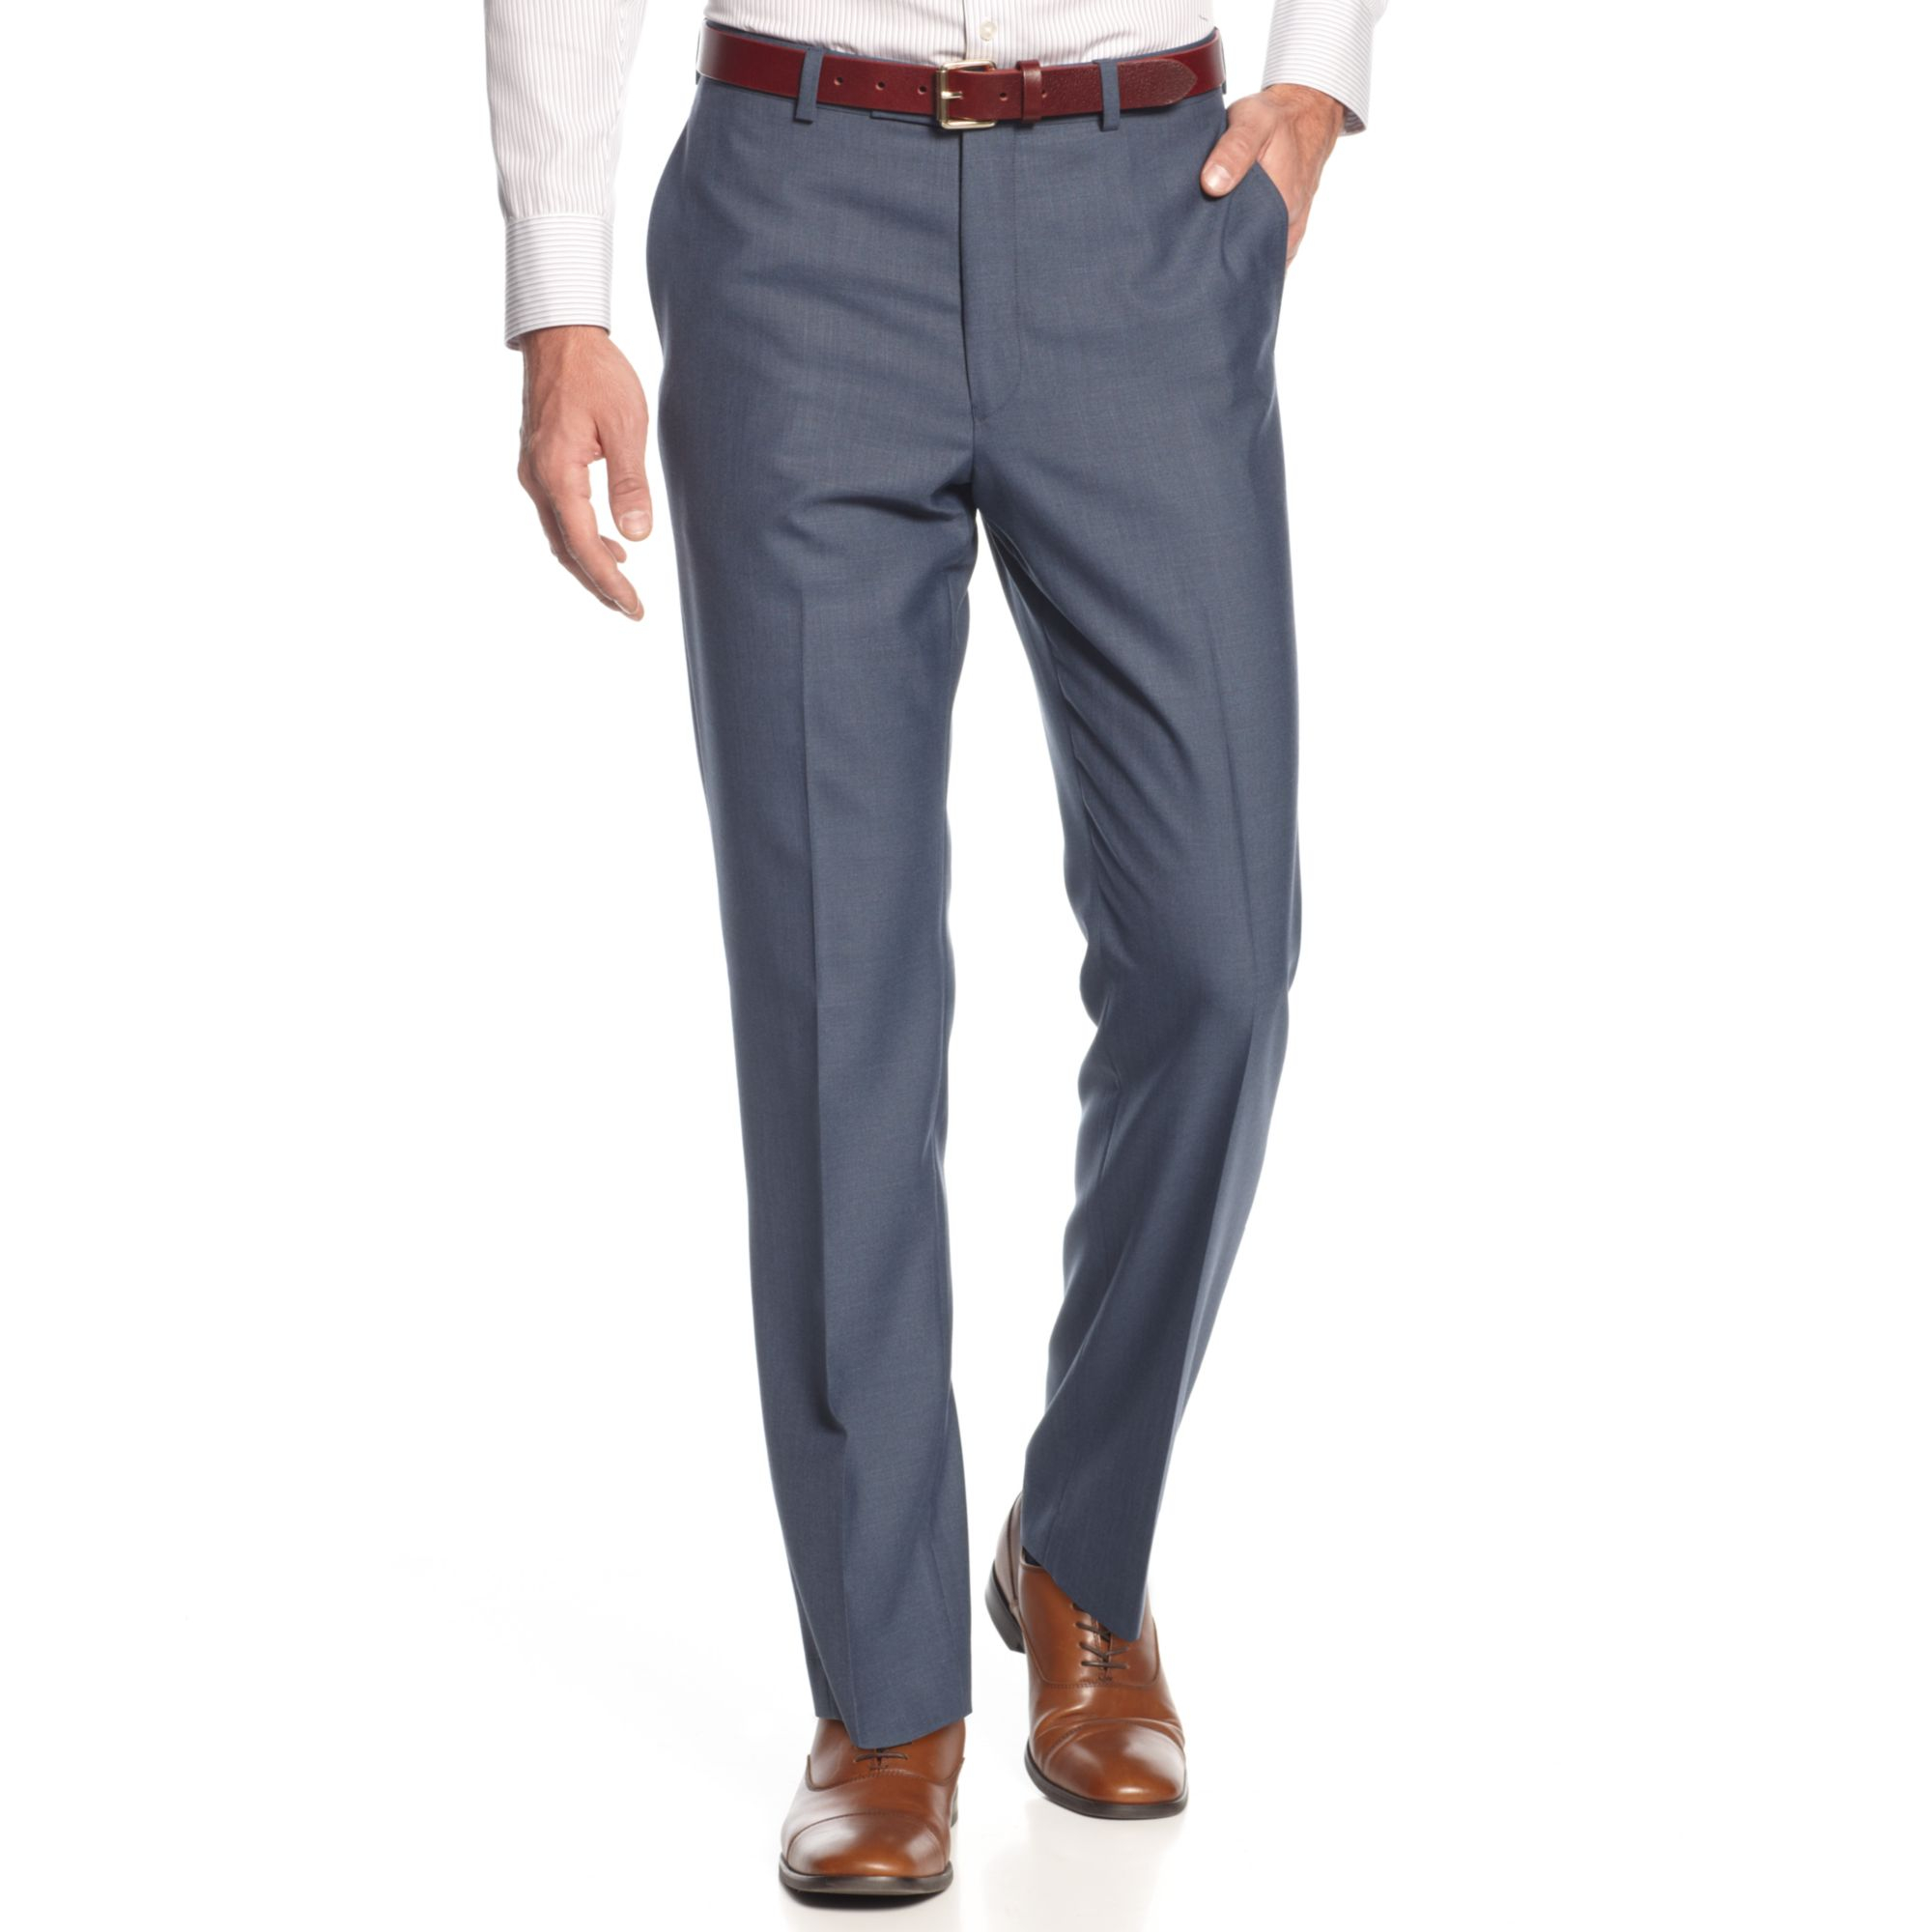 Calvin Klein Blue Sharkskin Dress Pants Slim Fit For Men